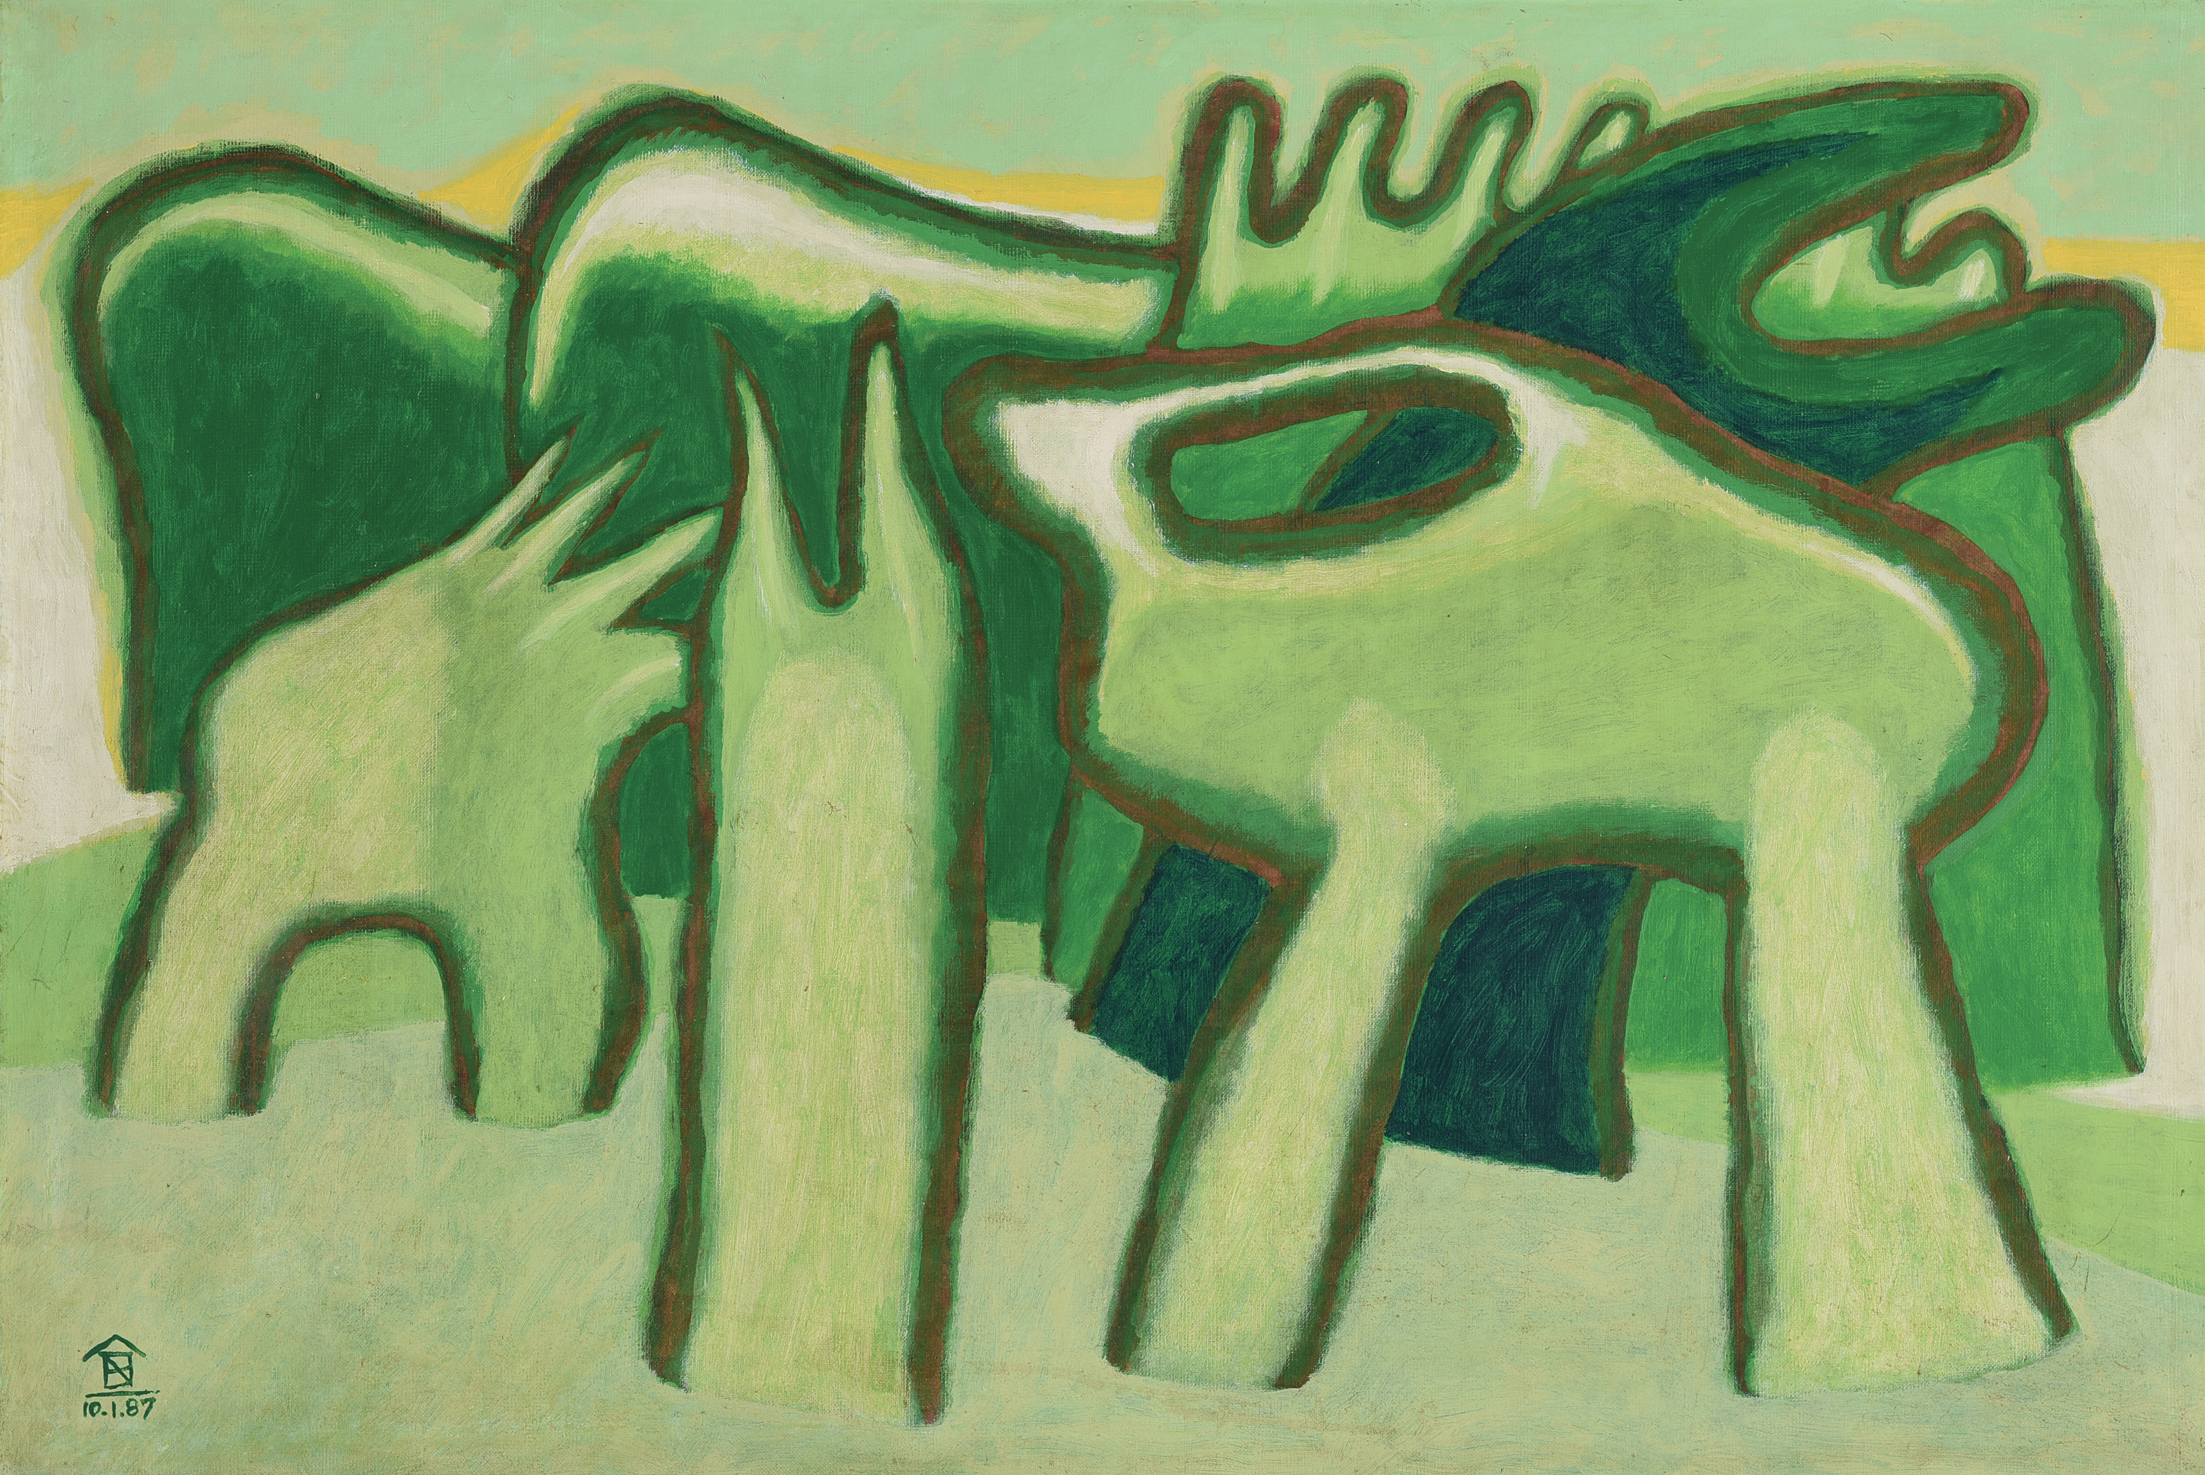 Nashar, Green Rhythm, oil on canvas, 64 x 94 cm, 1987